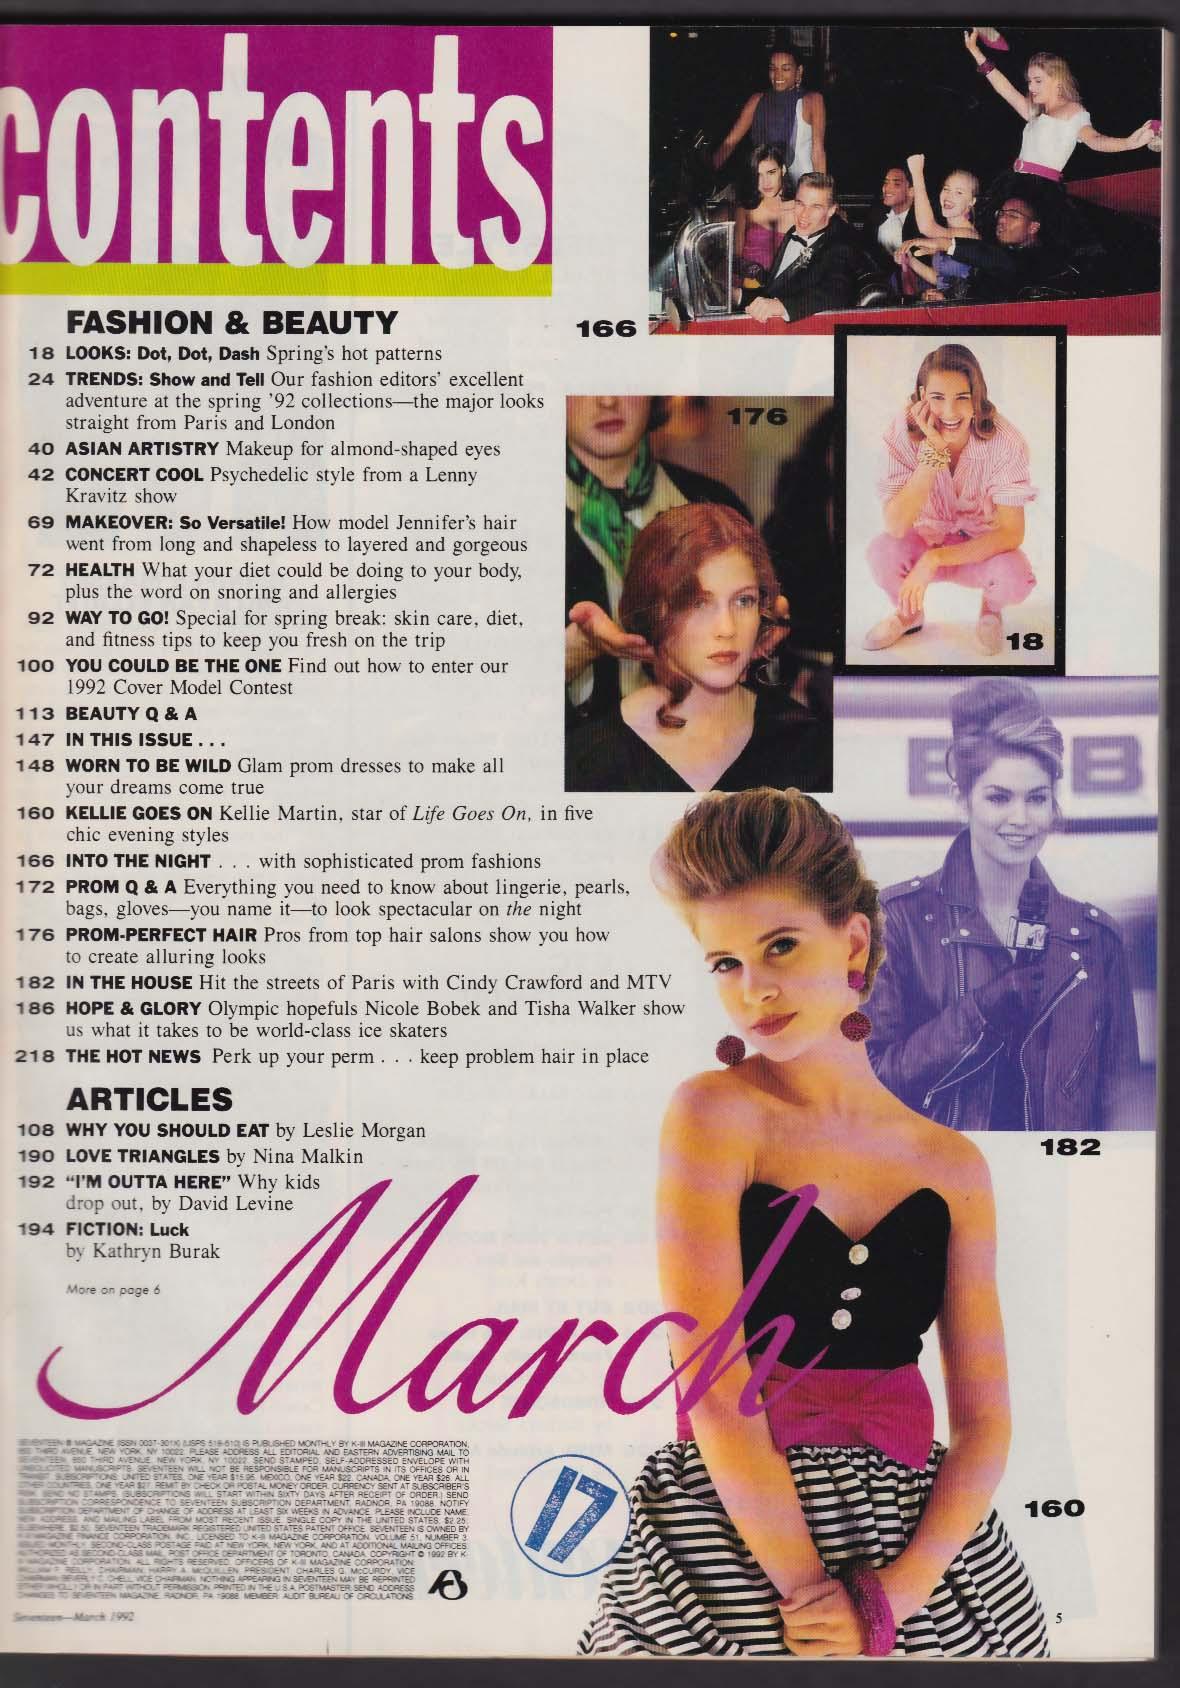 SEVENTEEN Cindy Crawford Kellie Martin John Cusack Brad Pitt 3 1992